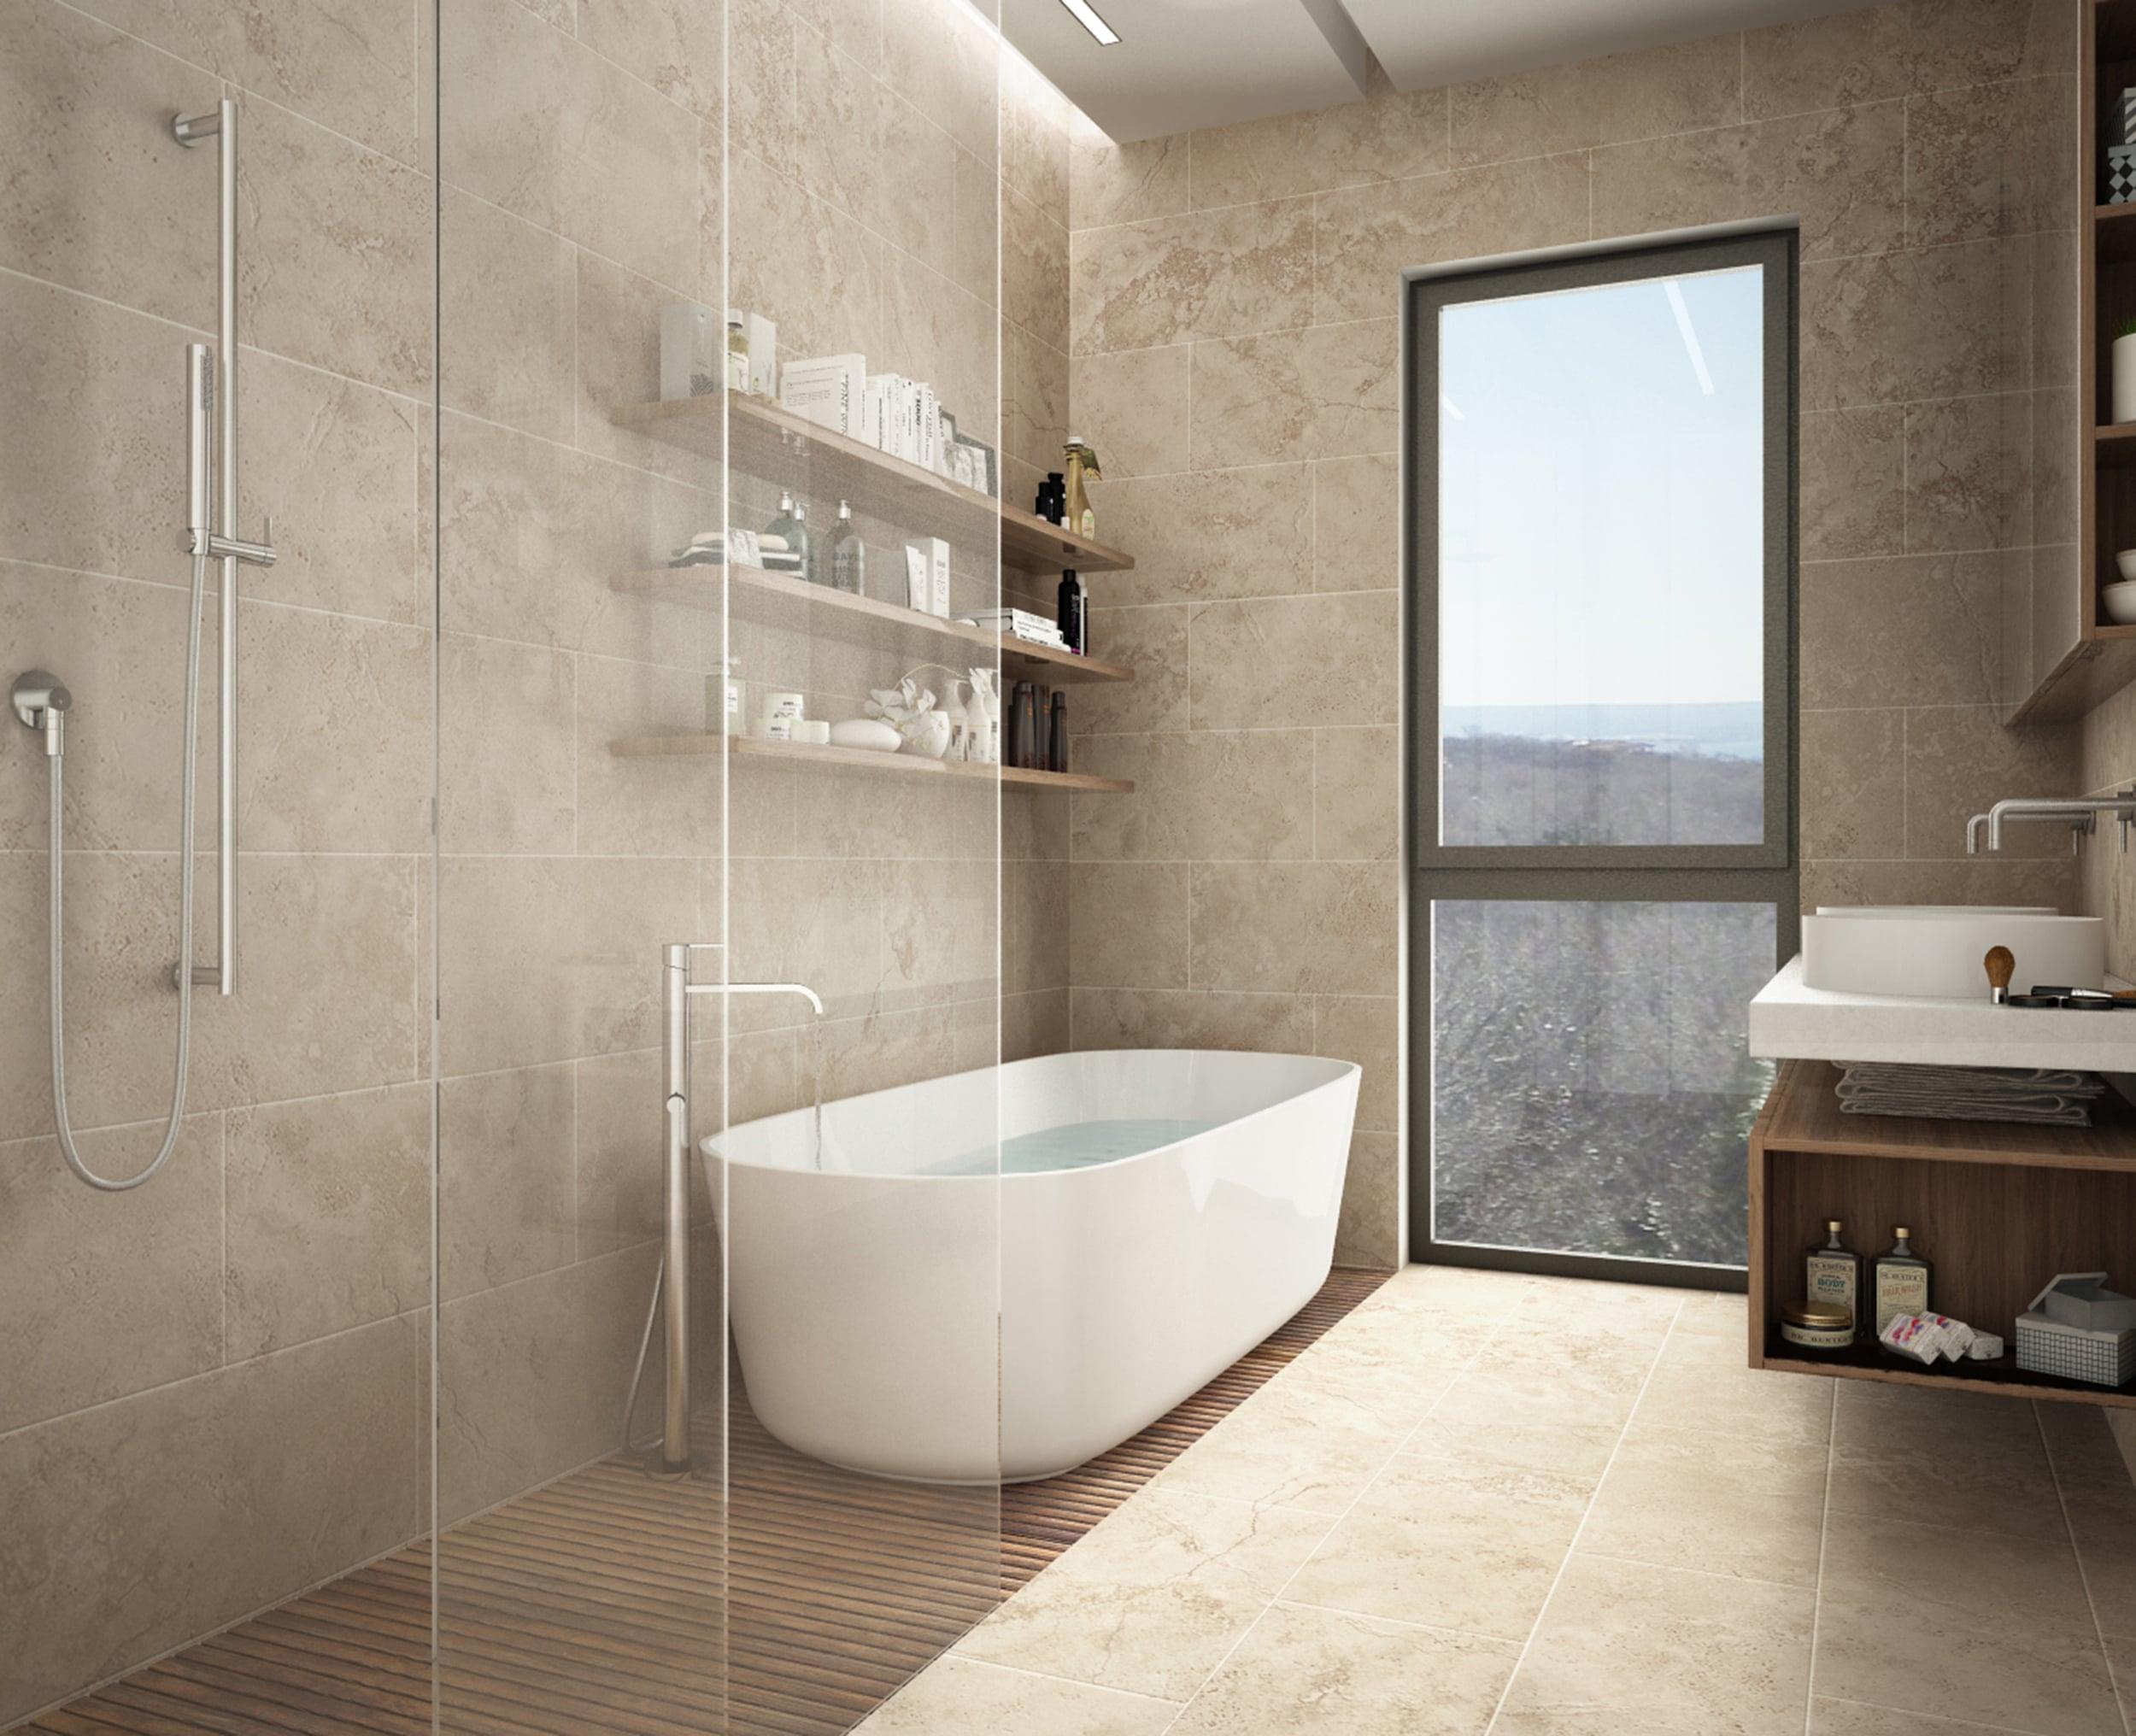 Moderniser Salle De Bain nos idées pour moderniser votre salle de bain à moindre coût !